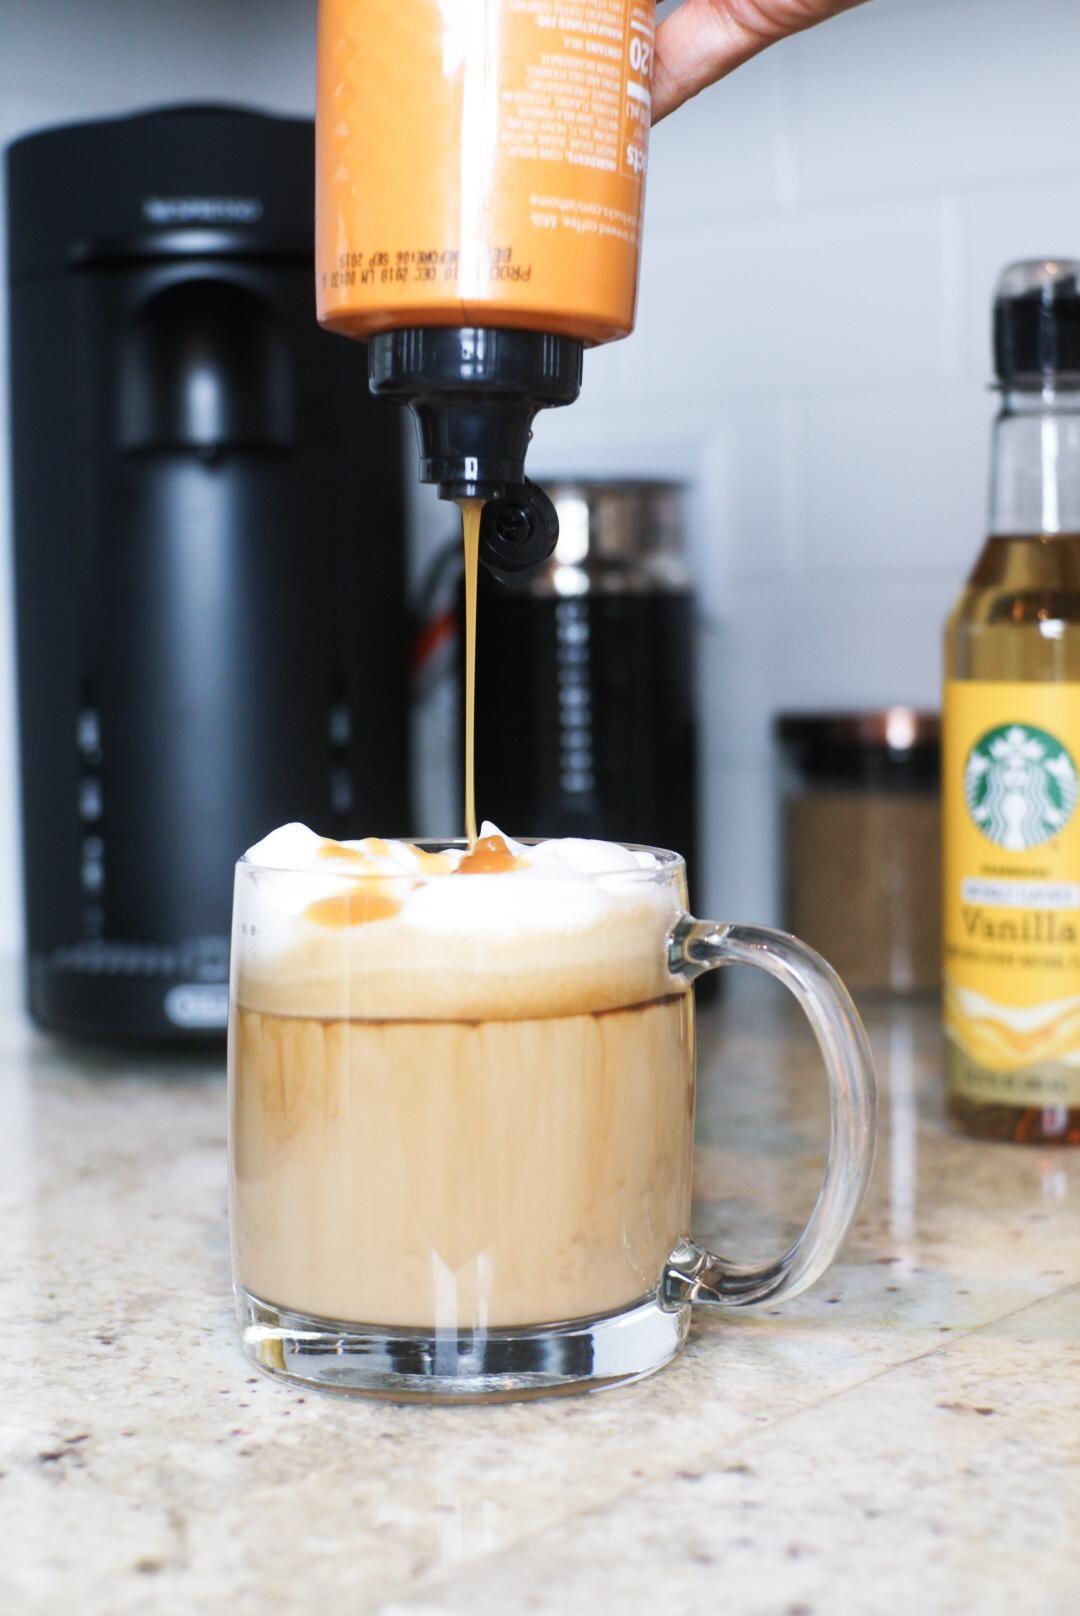 Coffee Recipes with the Nespresso Espresso Machine - Demi Joie